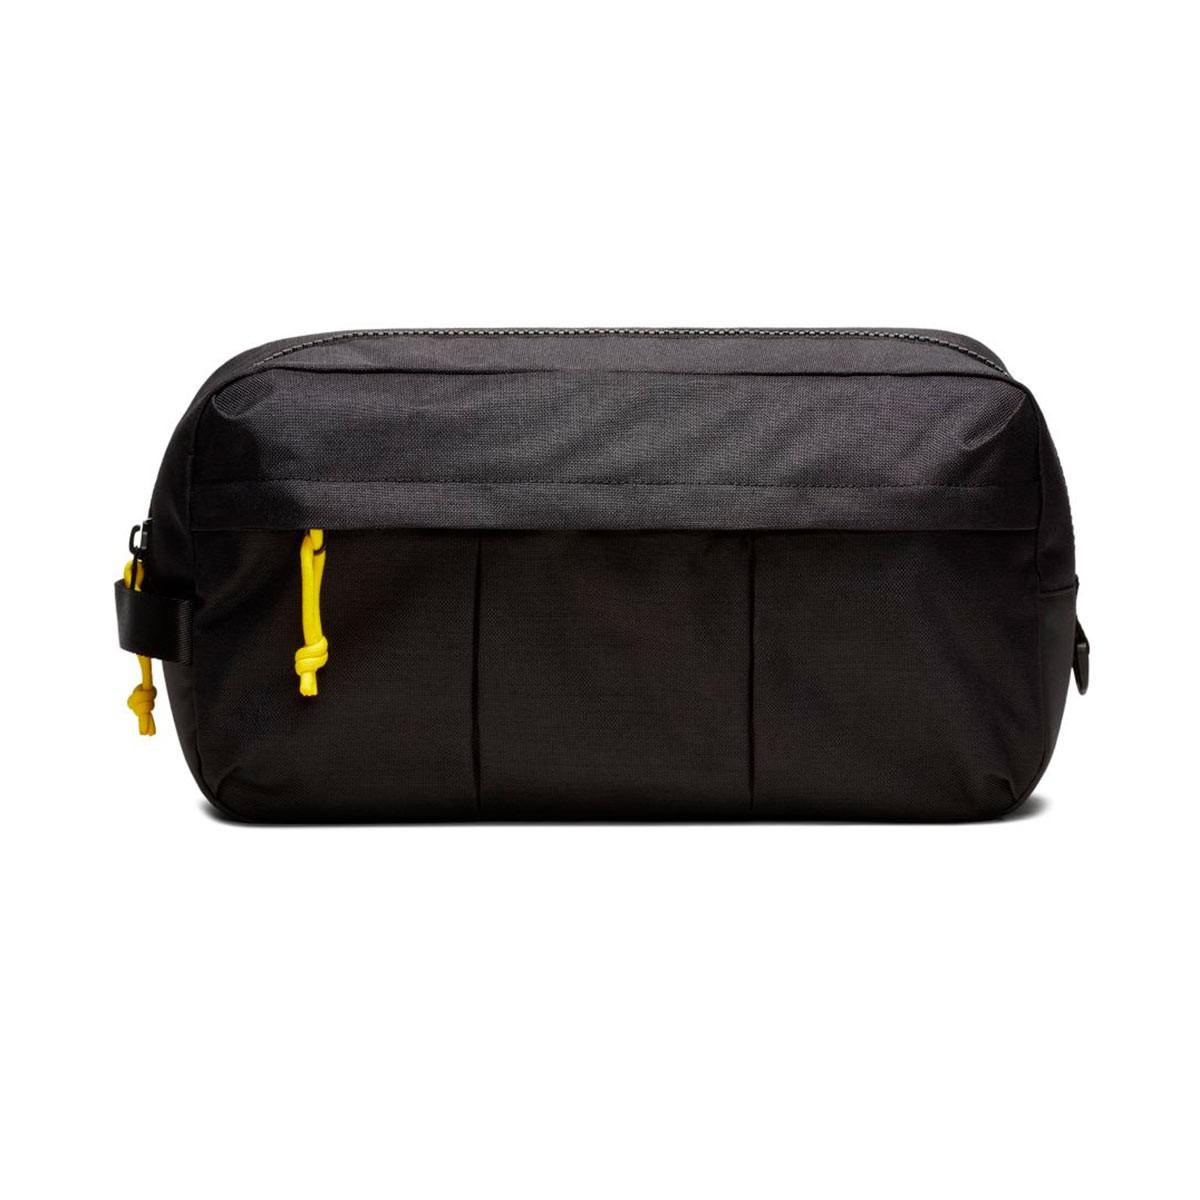 De Nike À Optical Chaussure Academy Sac Black Yellow Boutique uJc3T5l1FK